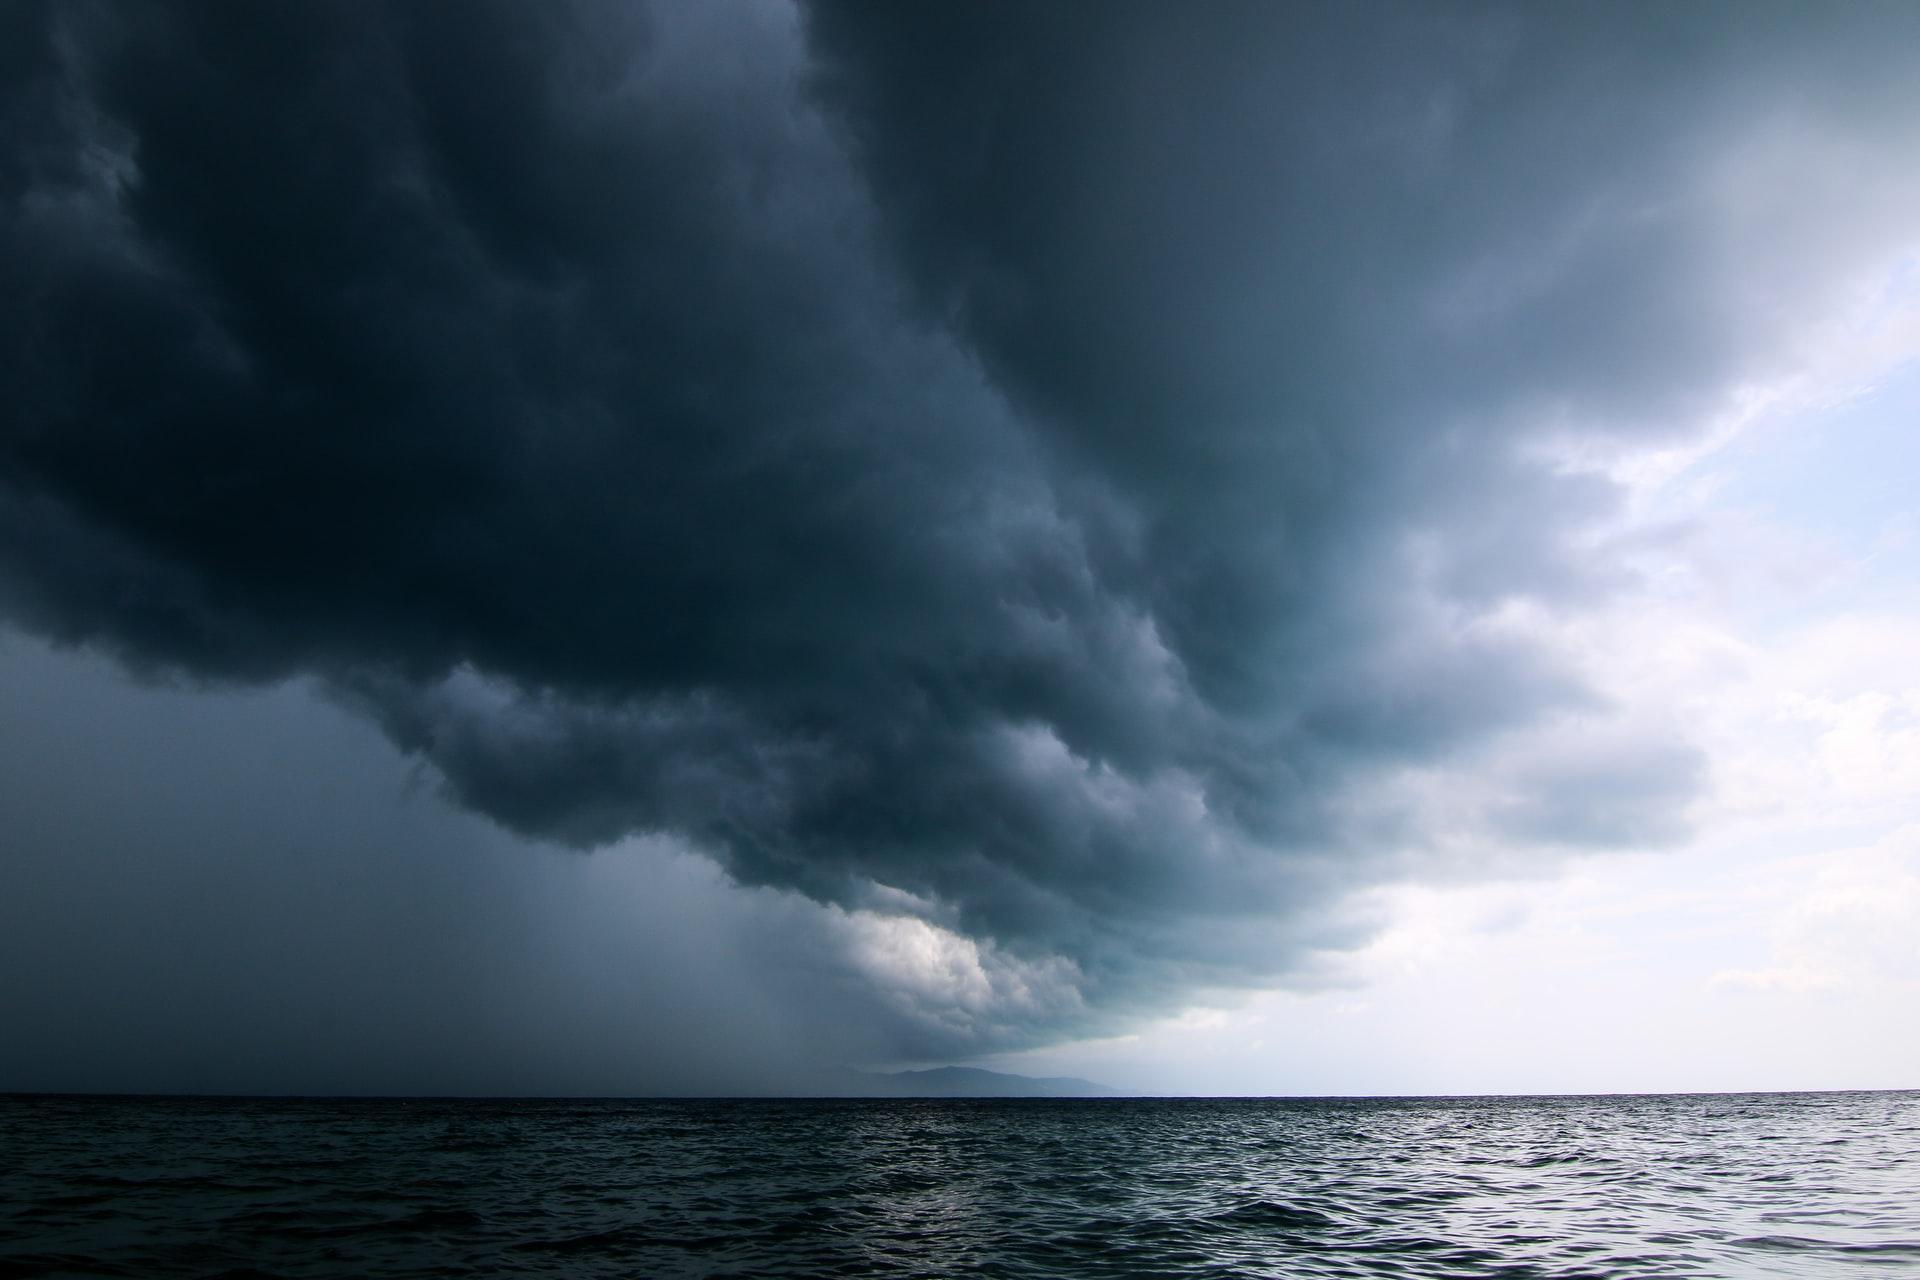 Prognoza pogody na tydzień 29.06-05.07.2020